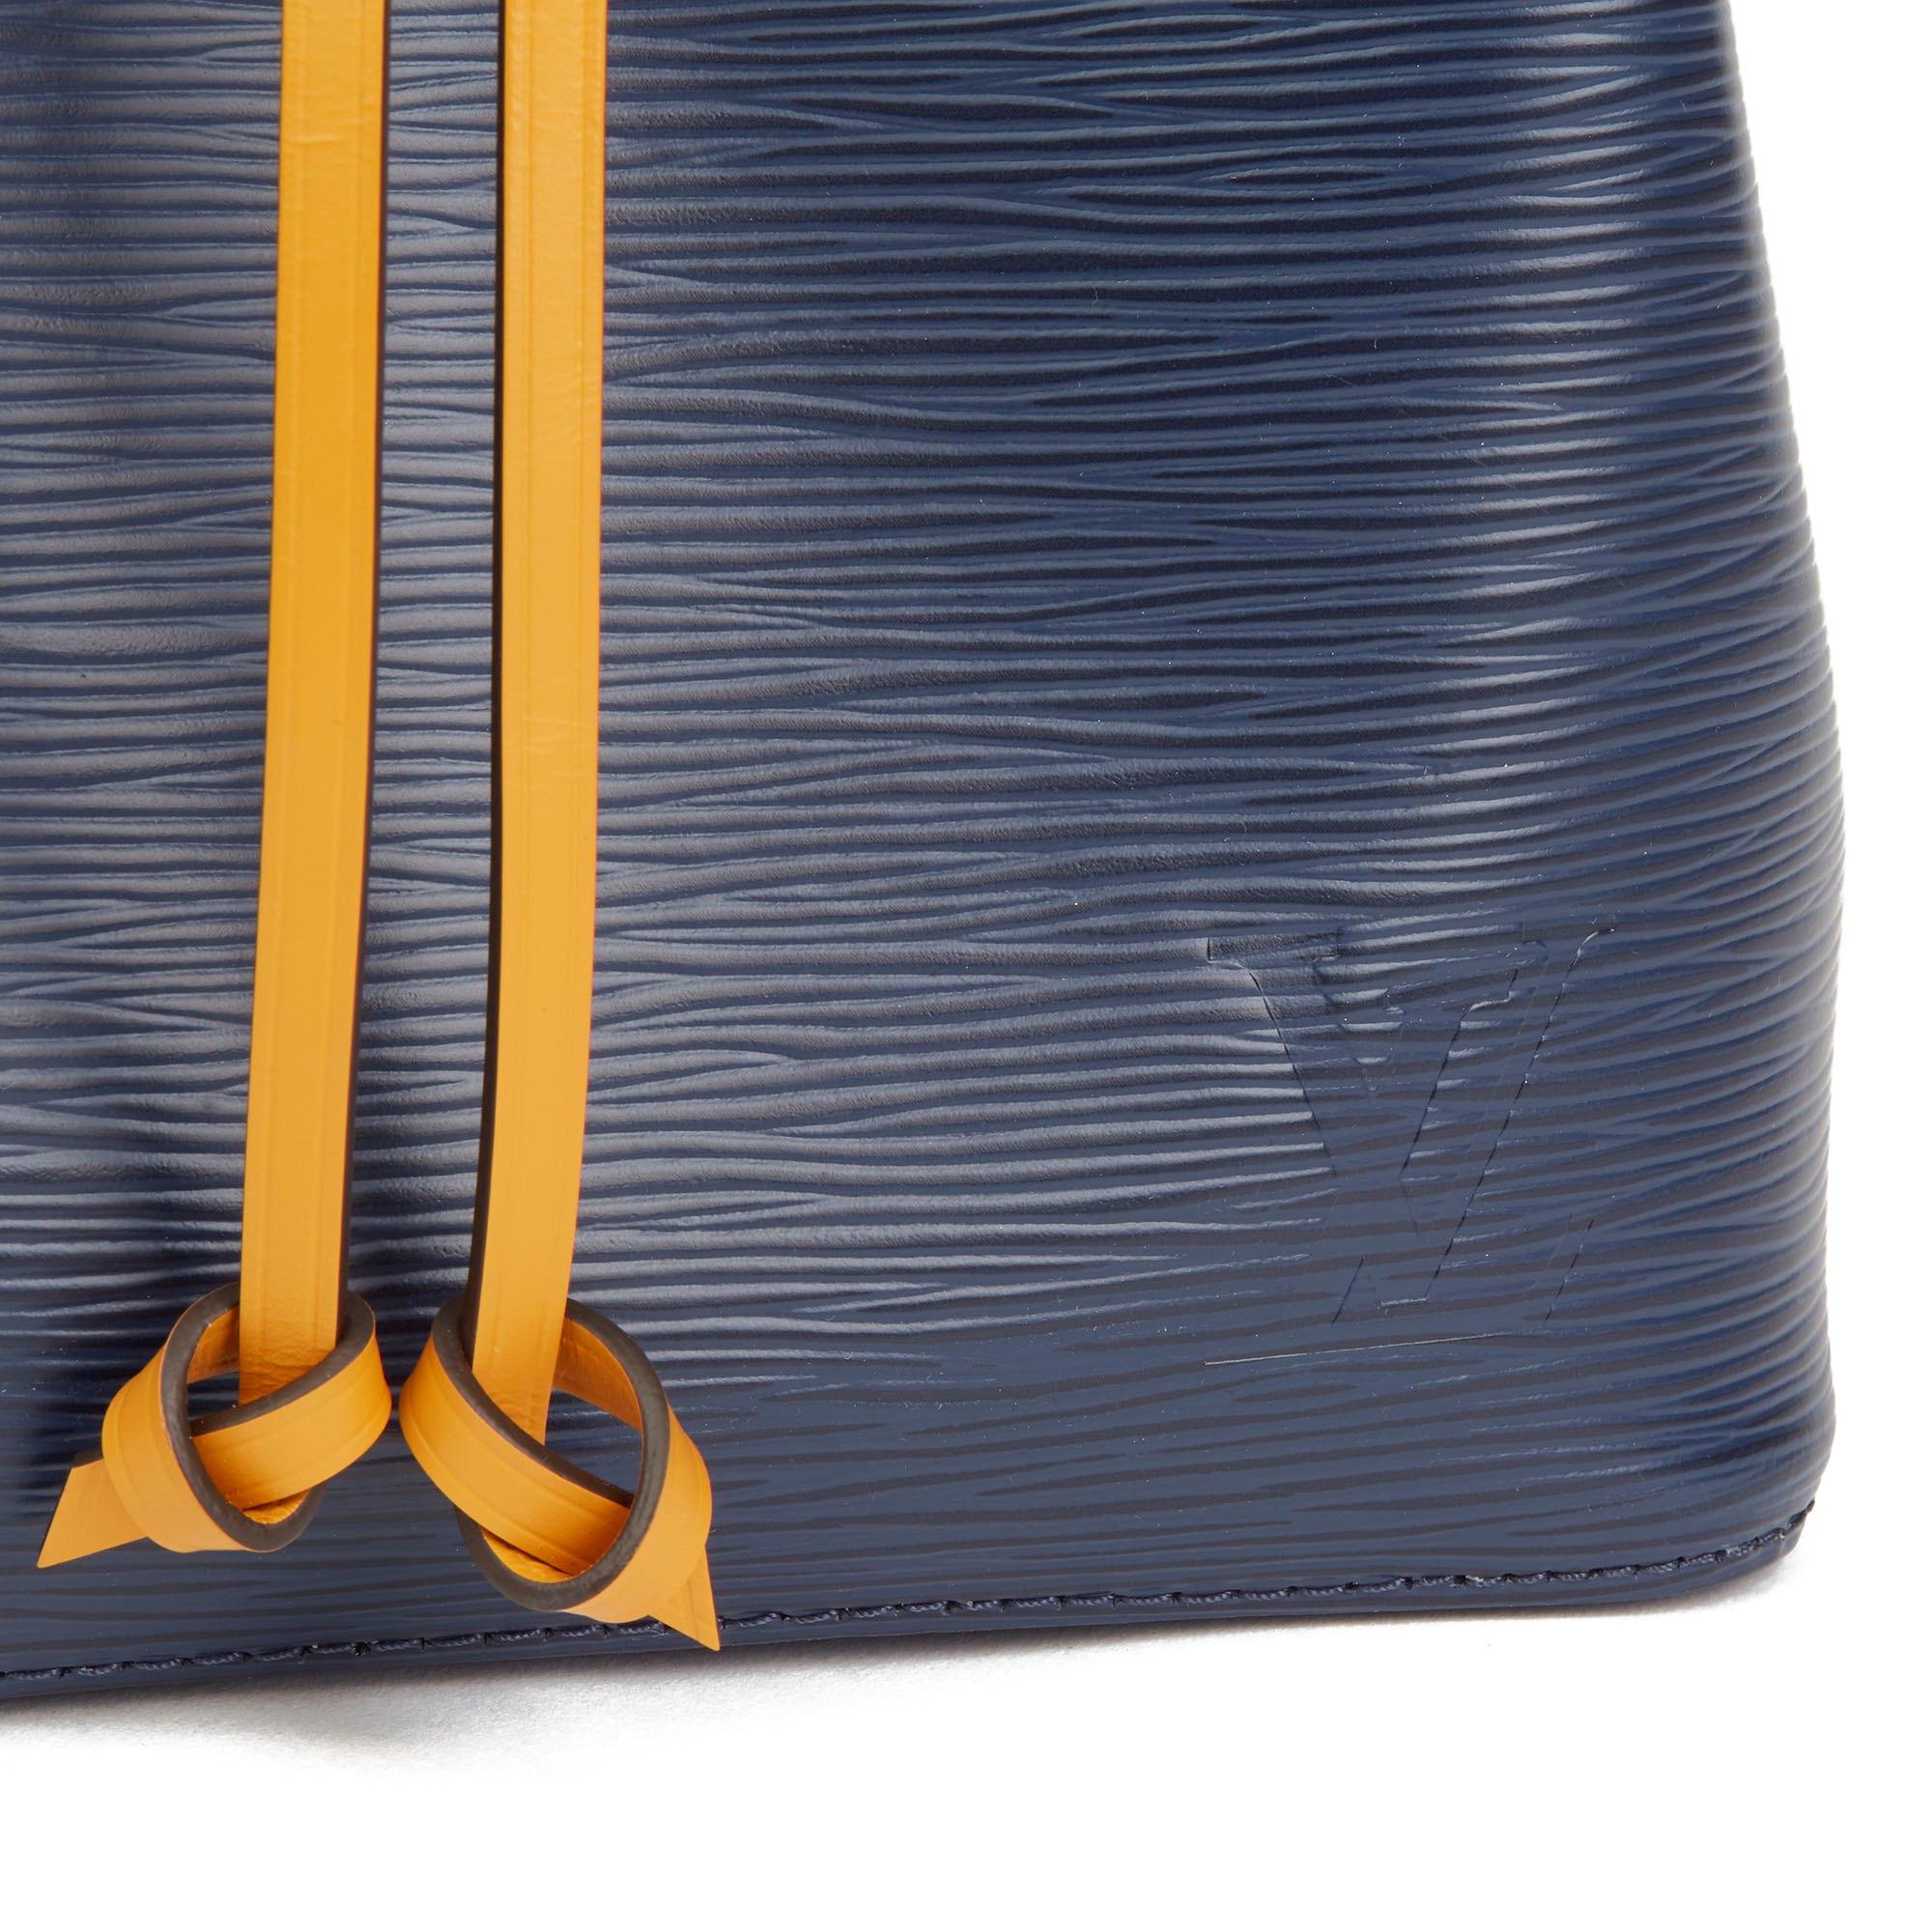 Louis Vuitton Indigo & Safran Epi Leather NéoNoé BB